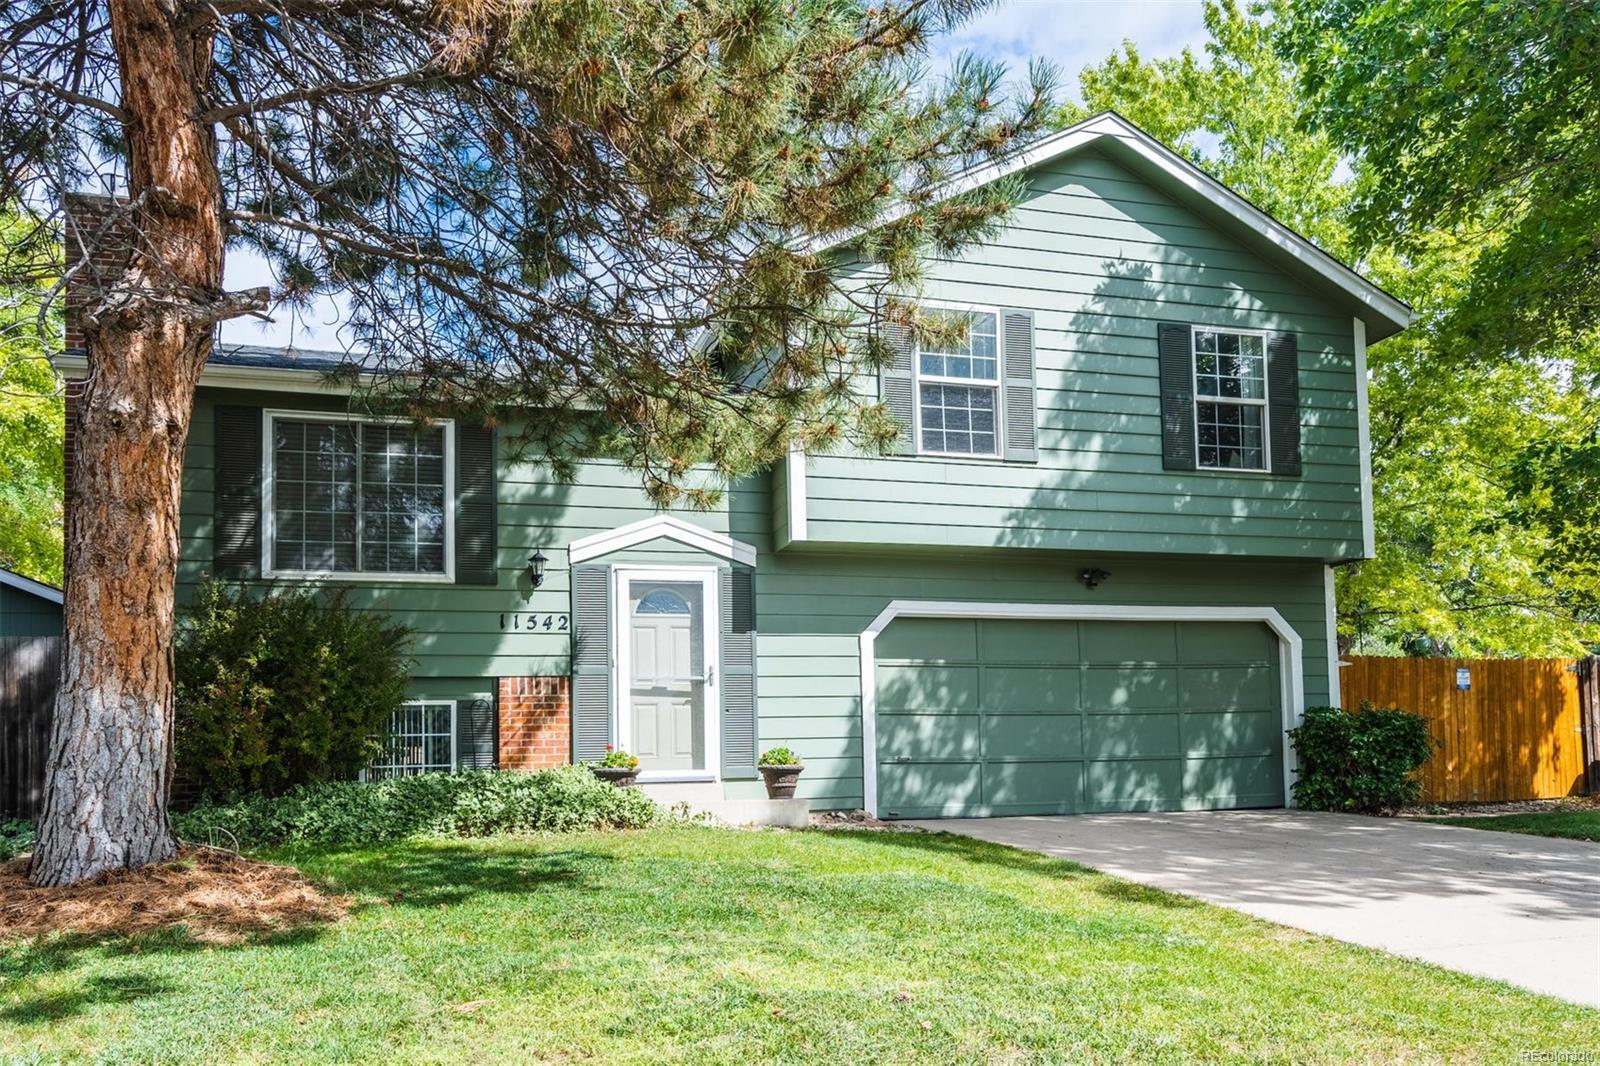 11542 Saint Paul Court, Thornton, CO 80233 - Thornton, CO real estate listing